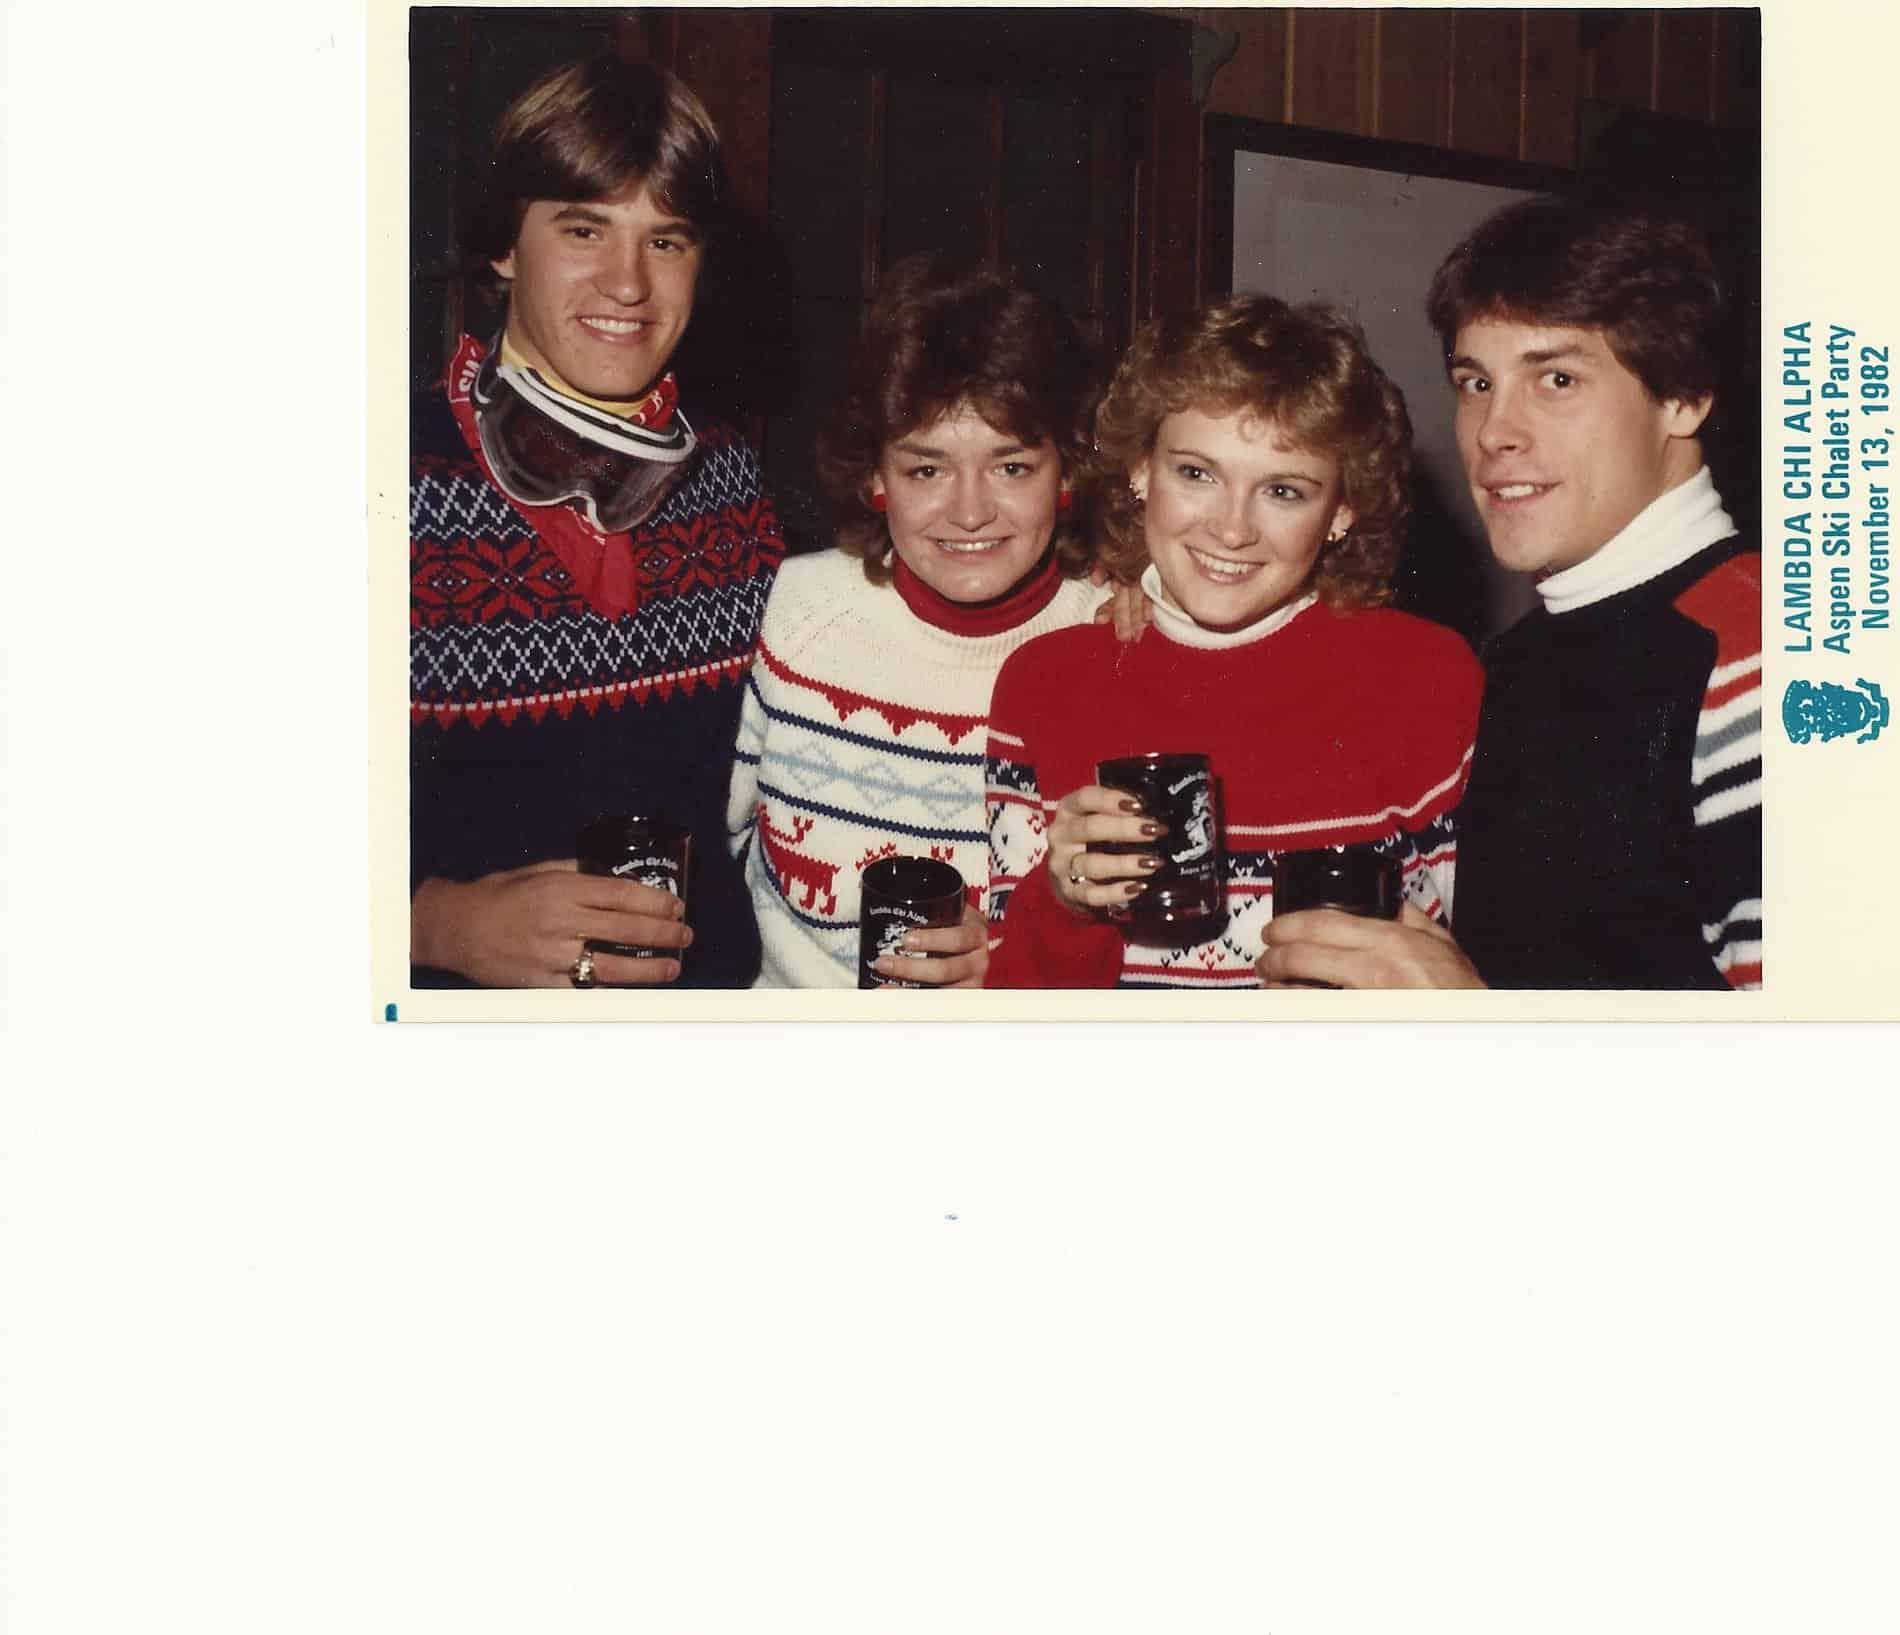 1982 Aspen Ski Party (Sankot)